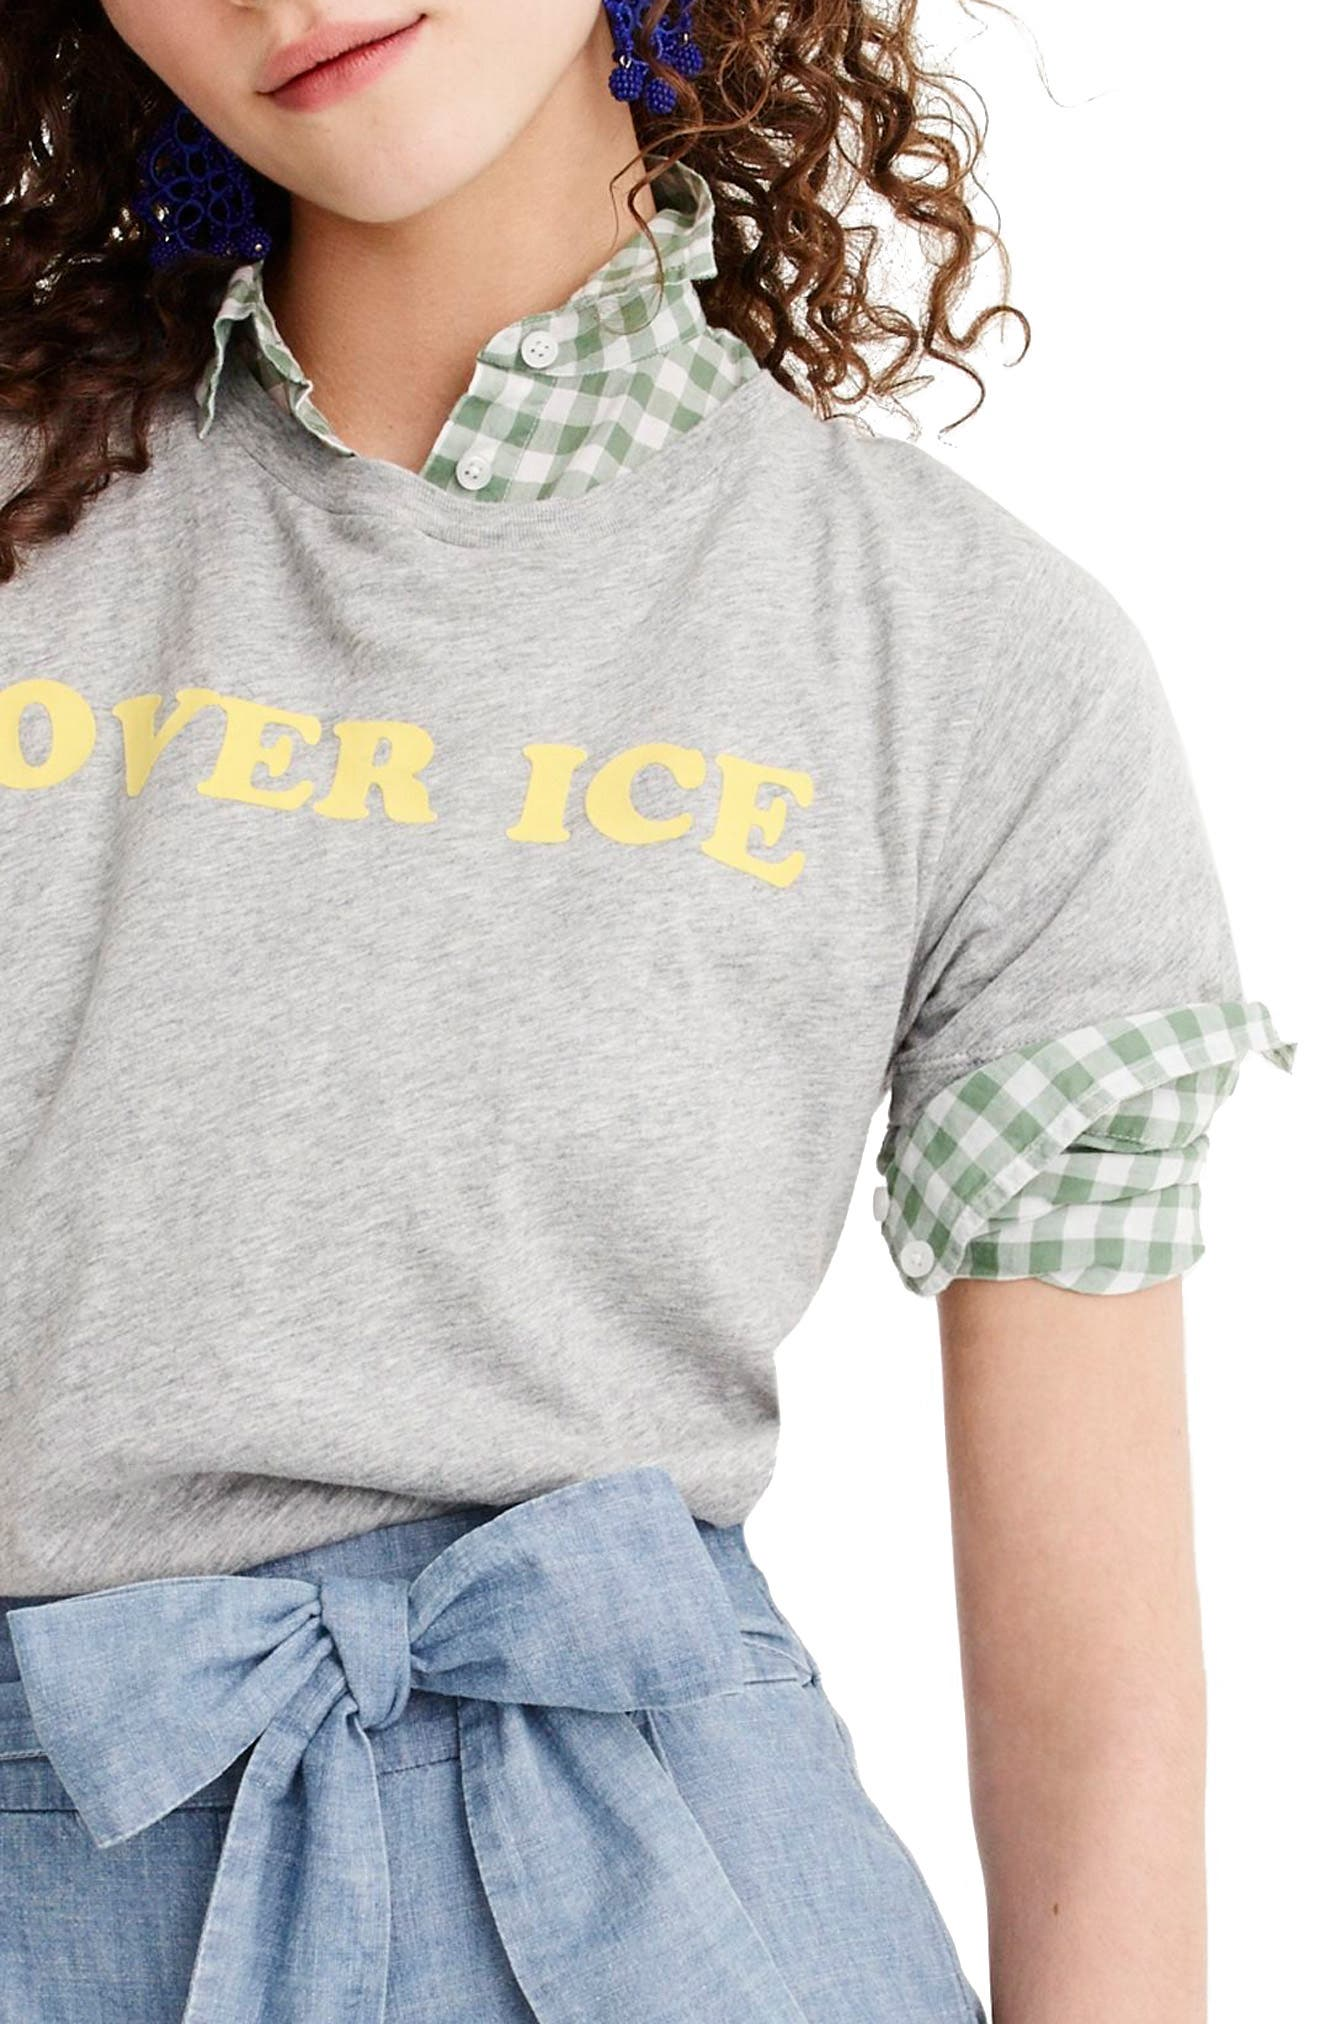 Over Ice Tee,                         Main,                         color, Heather Grey